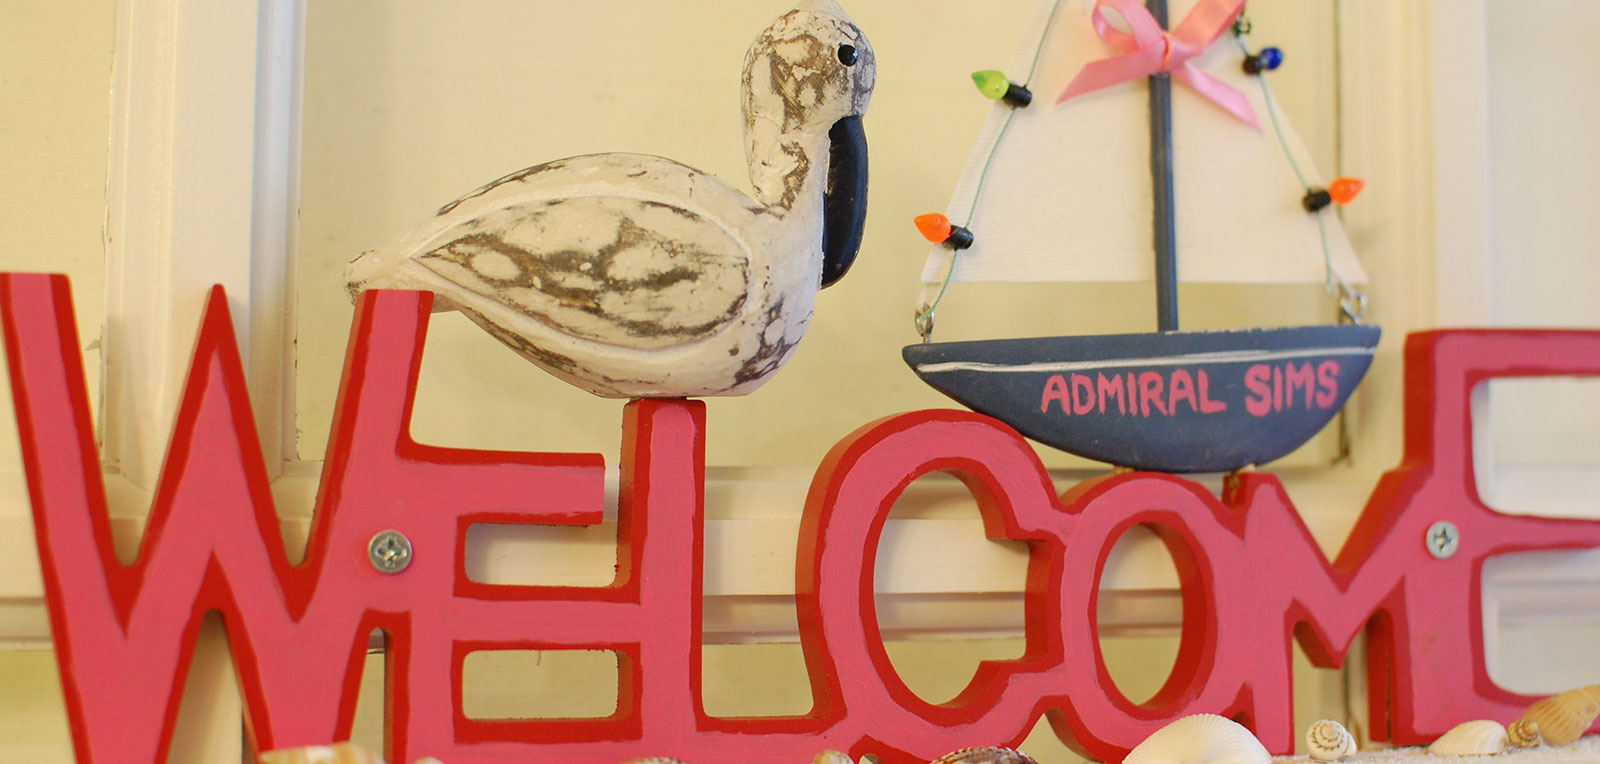 Admiral Sims Welcome Sign | ADMIRAL SIMS B&B, Newport Rhode Island